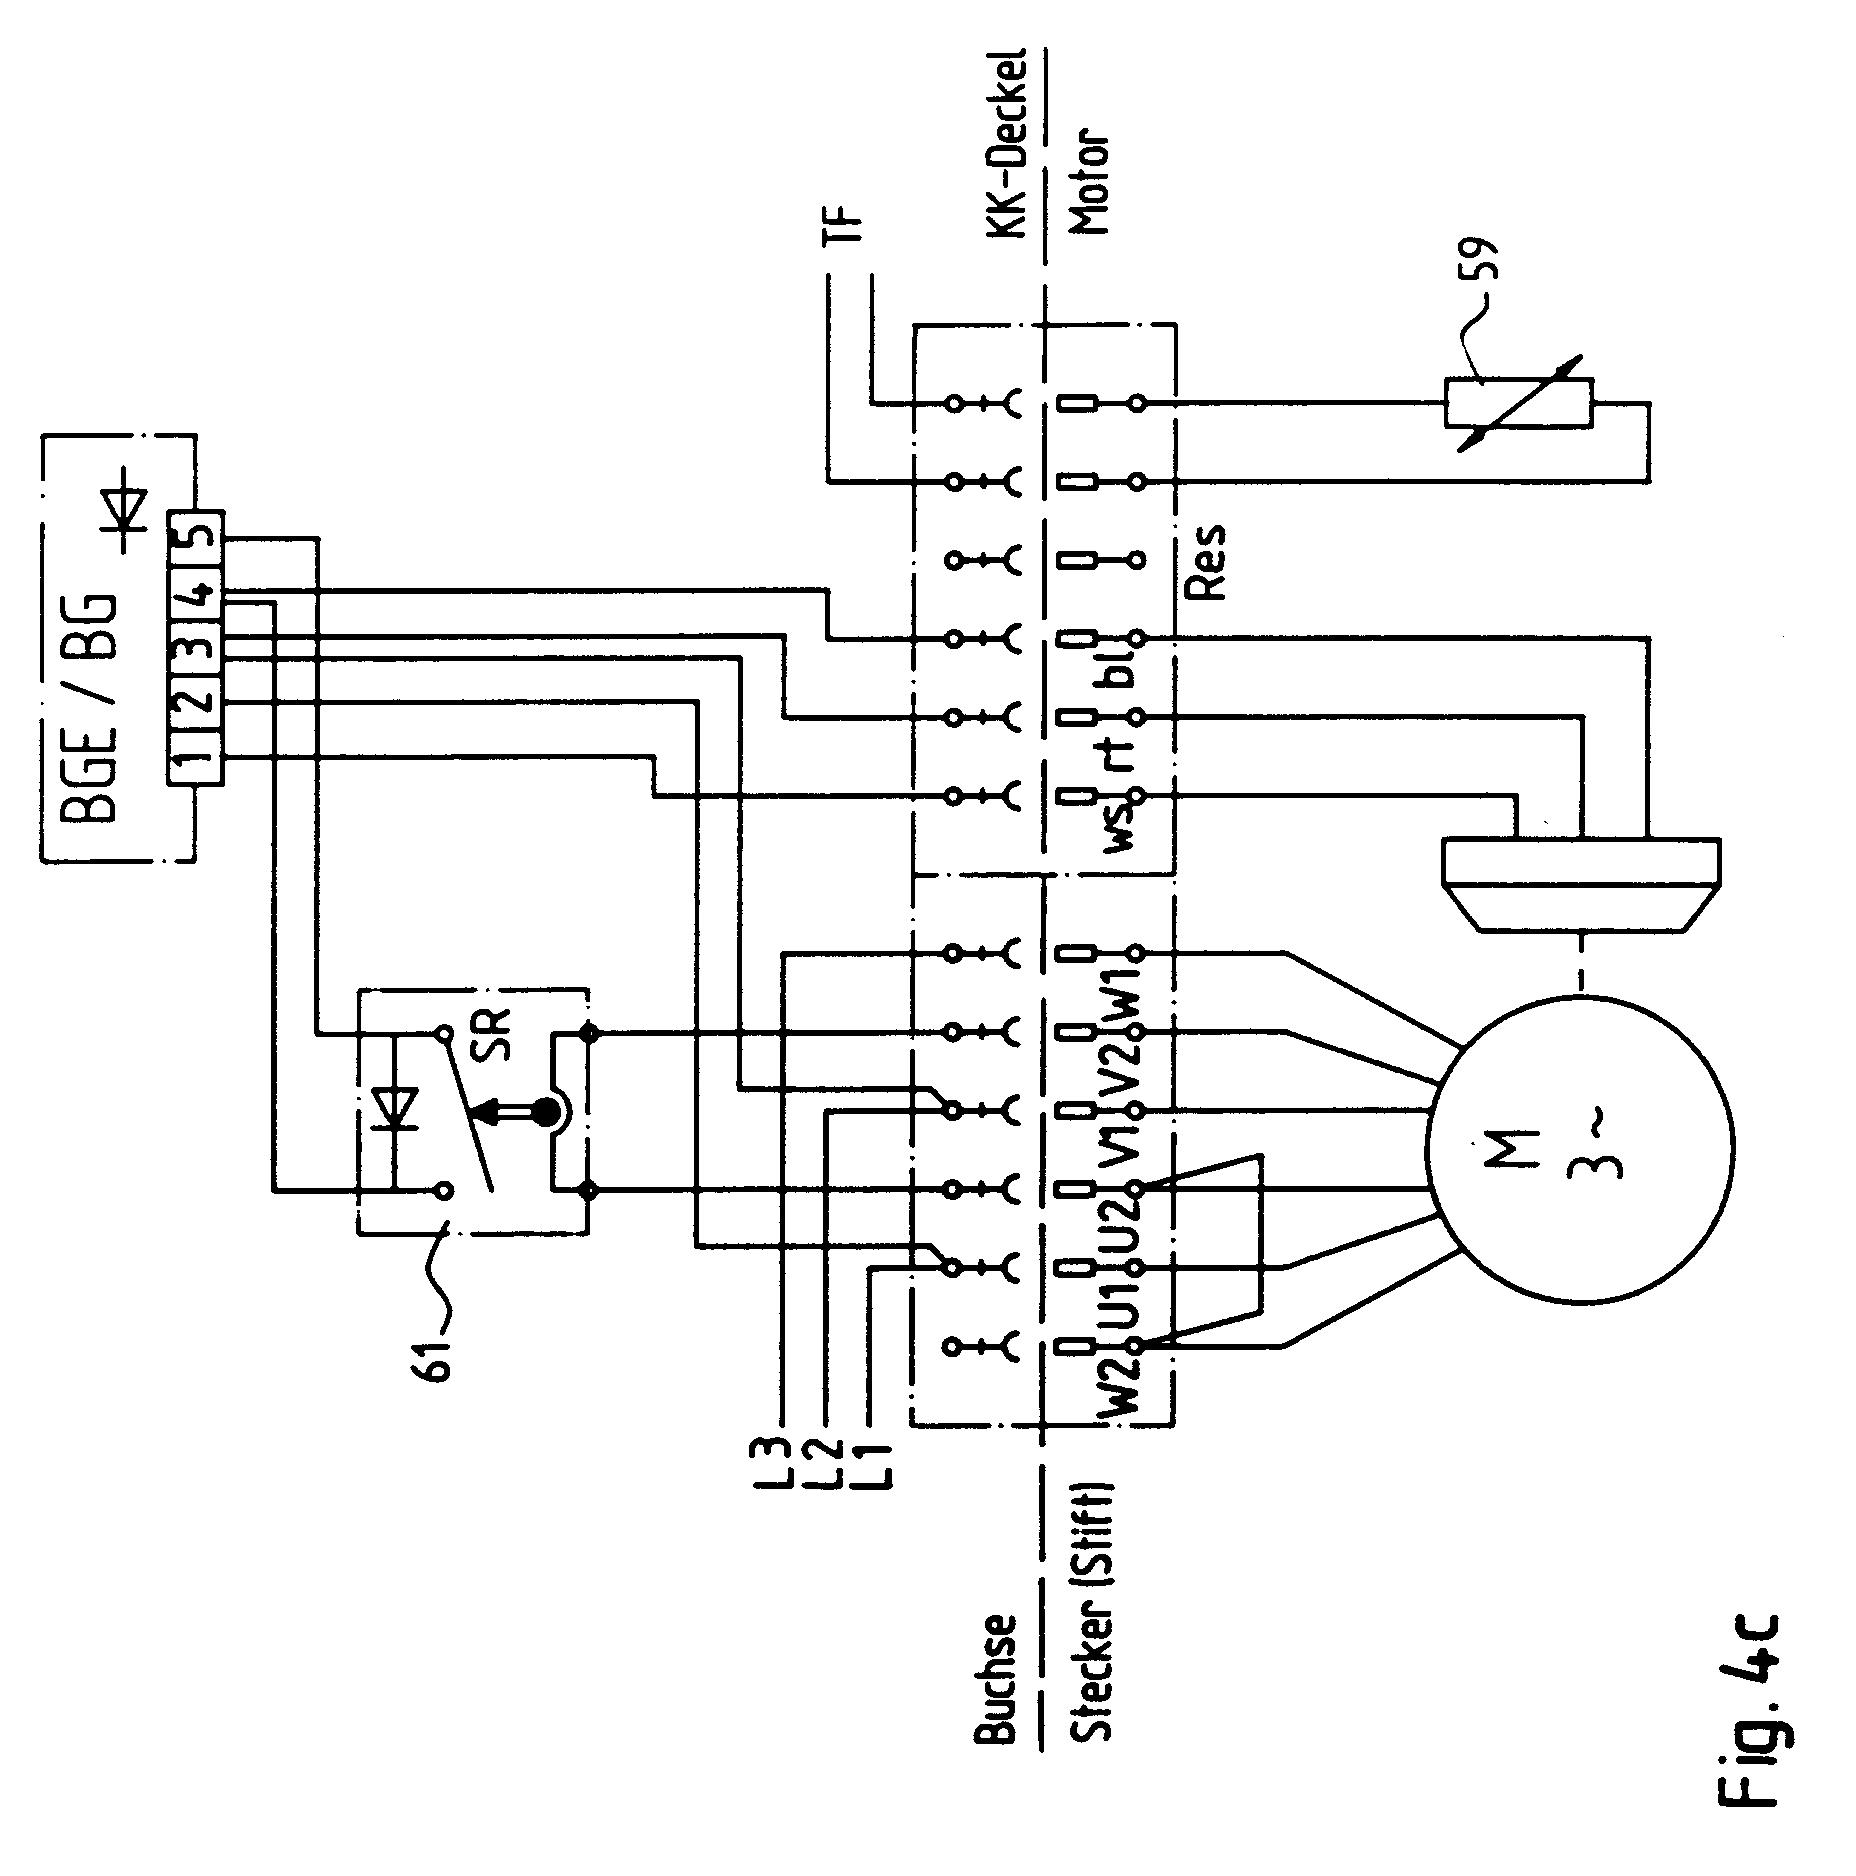 sew motor brake wiring diagram 230v motor wiring diagram wiring rh hg4 co Rotary Encoder Wiring-Diagram Dynapar Encoder Wiring